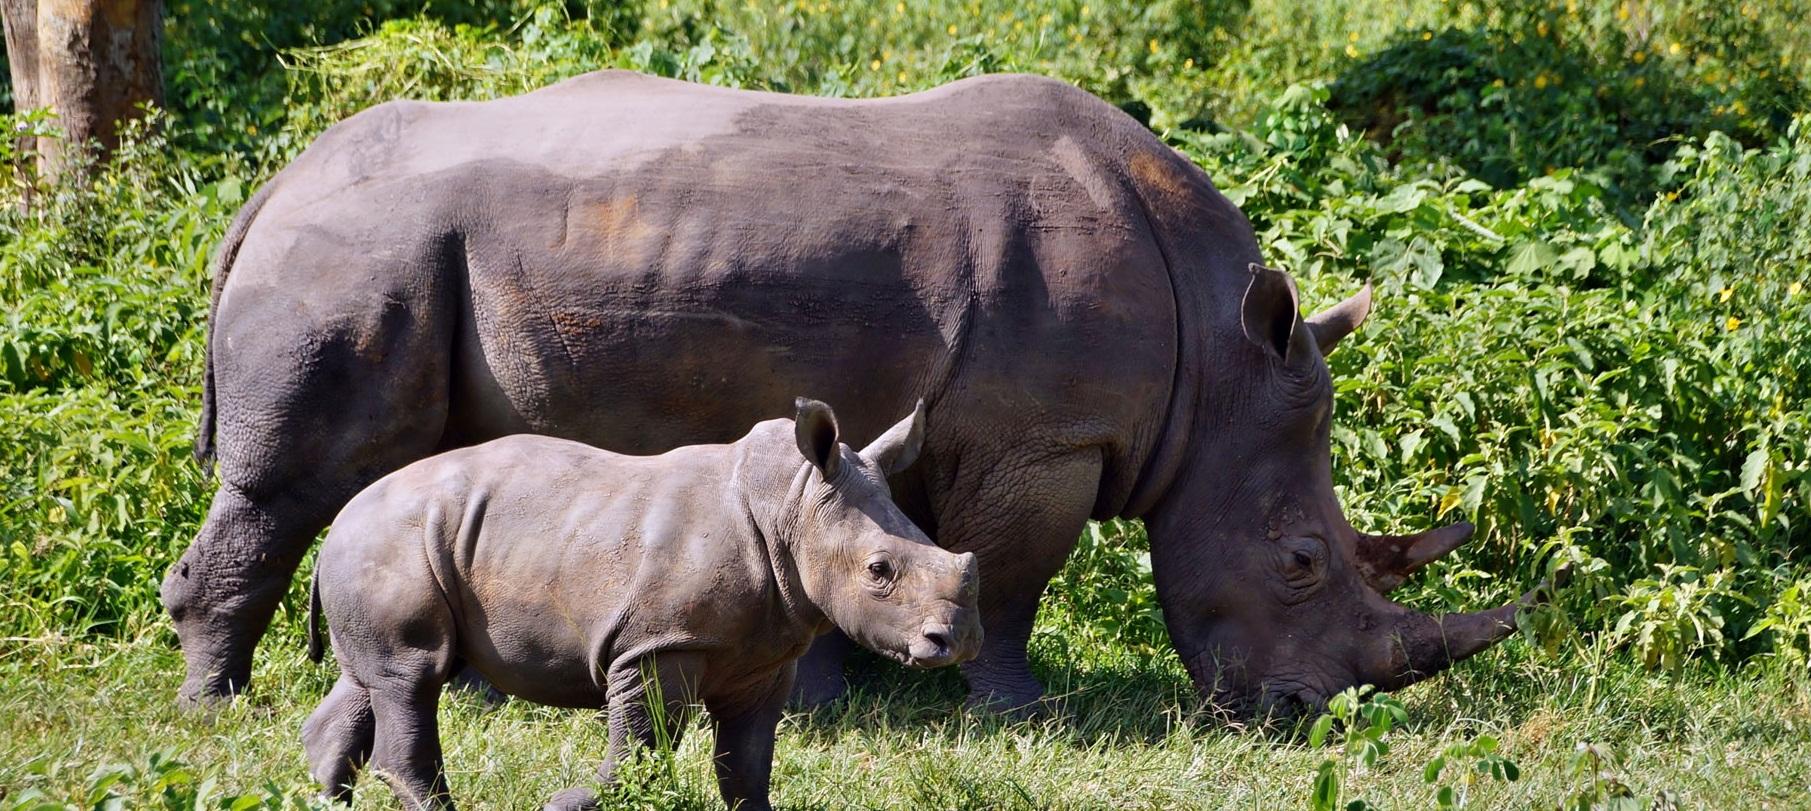 rhinos 24.jpg